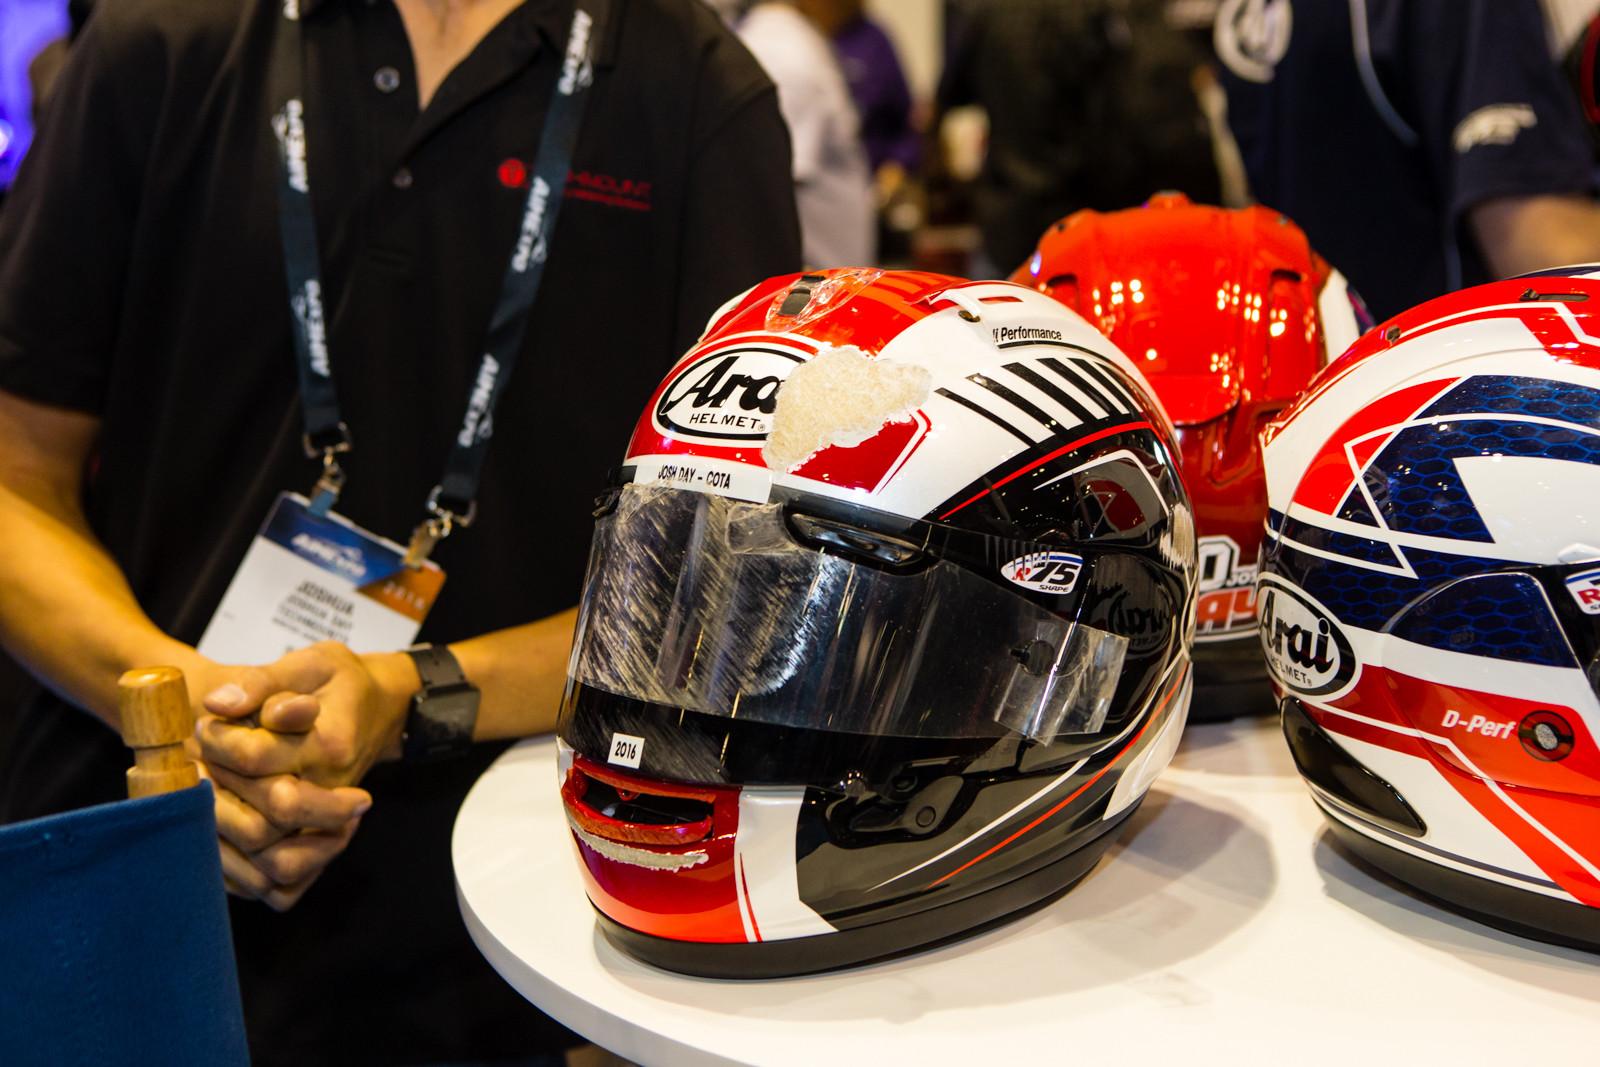 arai helmets 2016 american international motorcycle expo. Black Bedroom Furniture Sets. Home Design Ideas